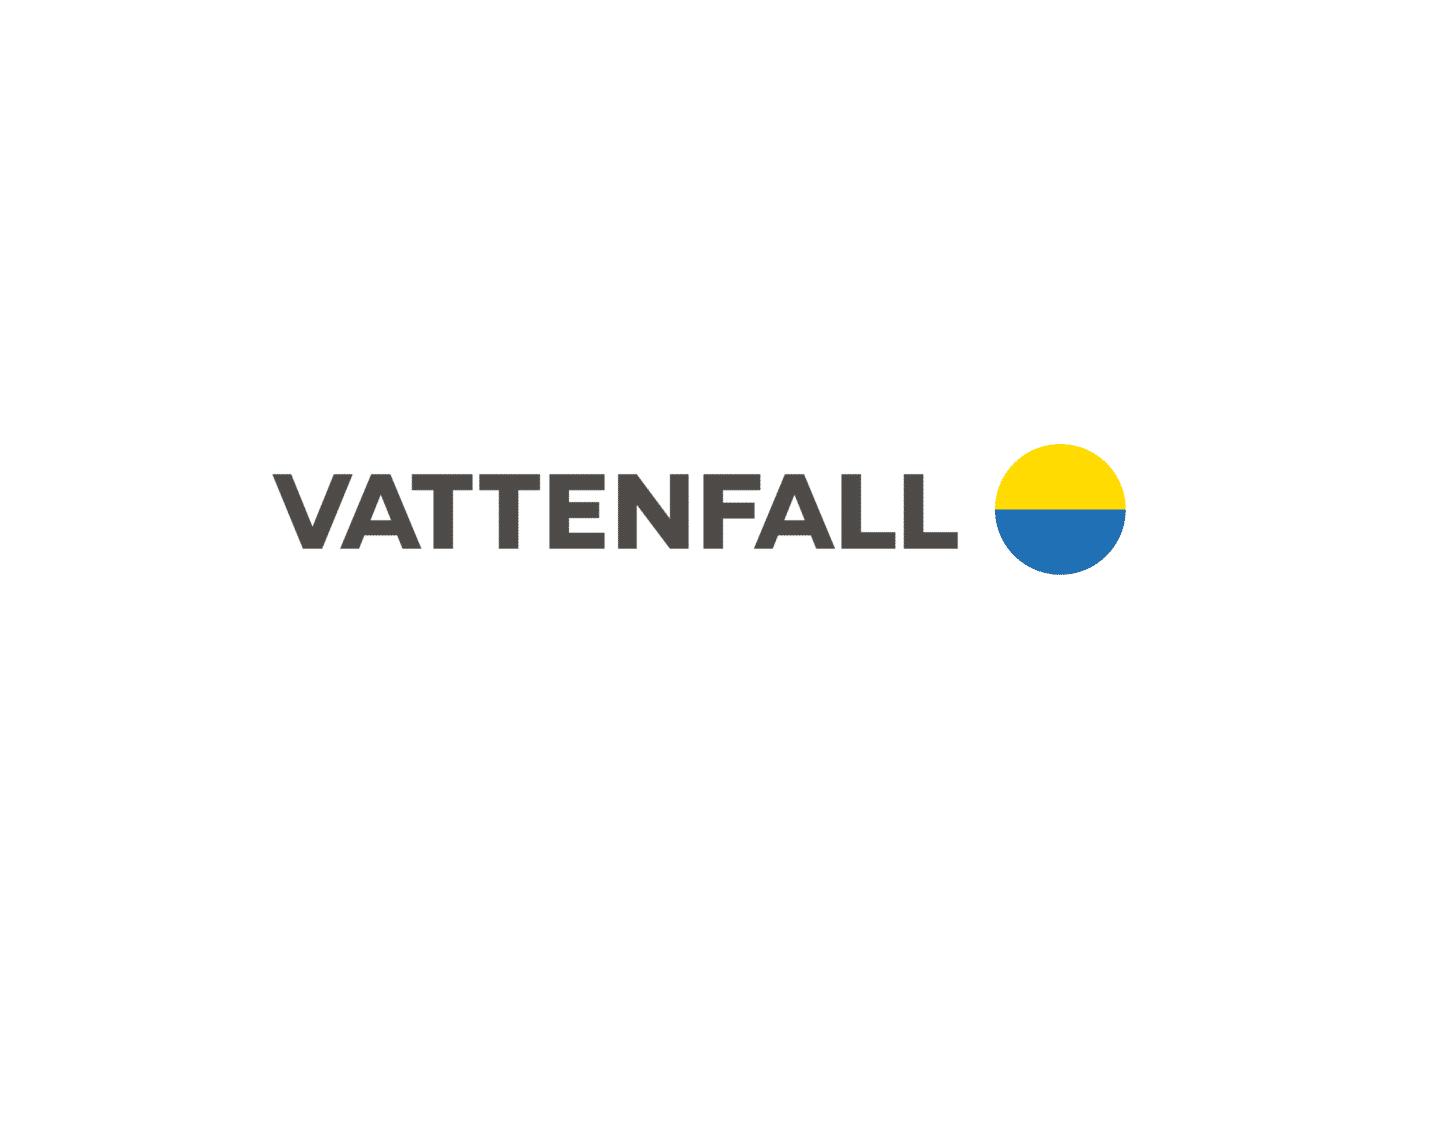 casestudy Vattenfall